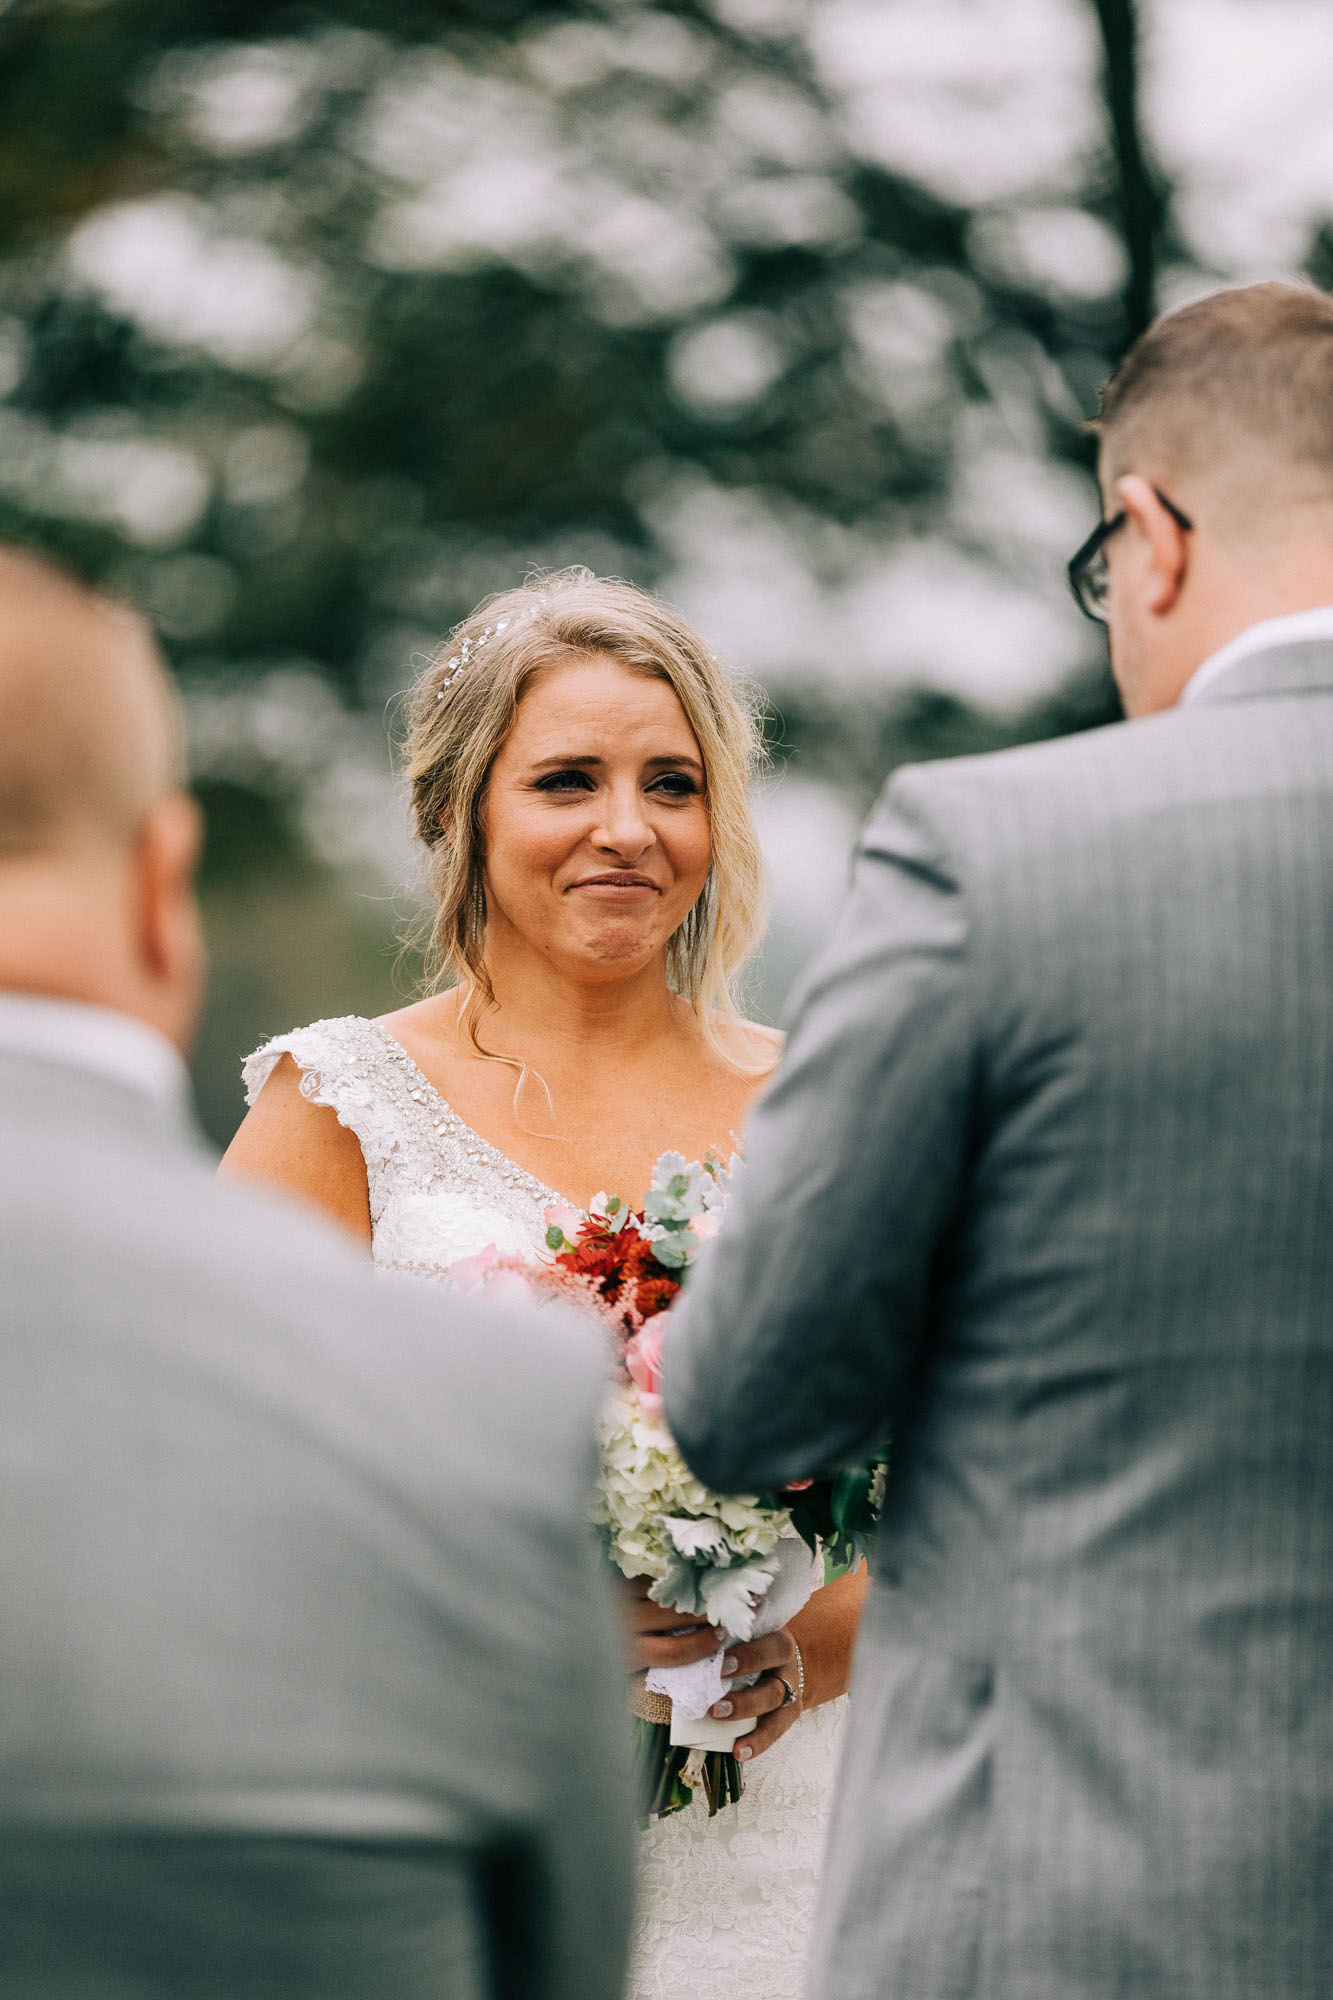 Lodge-at-Raven-Creek-October-wedding-29.jpg